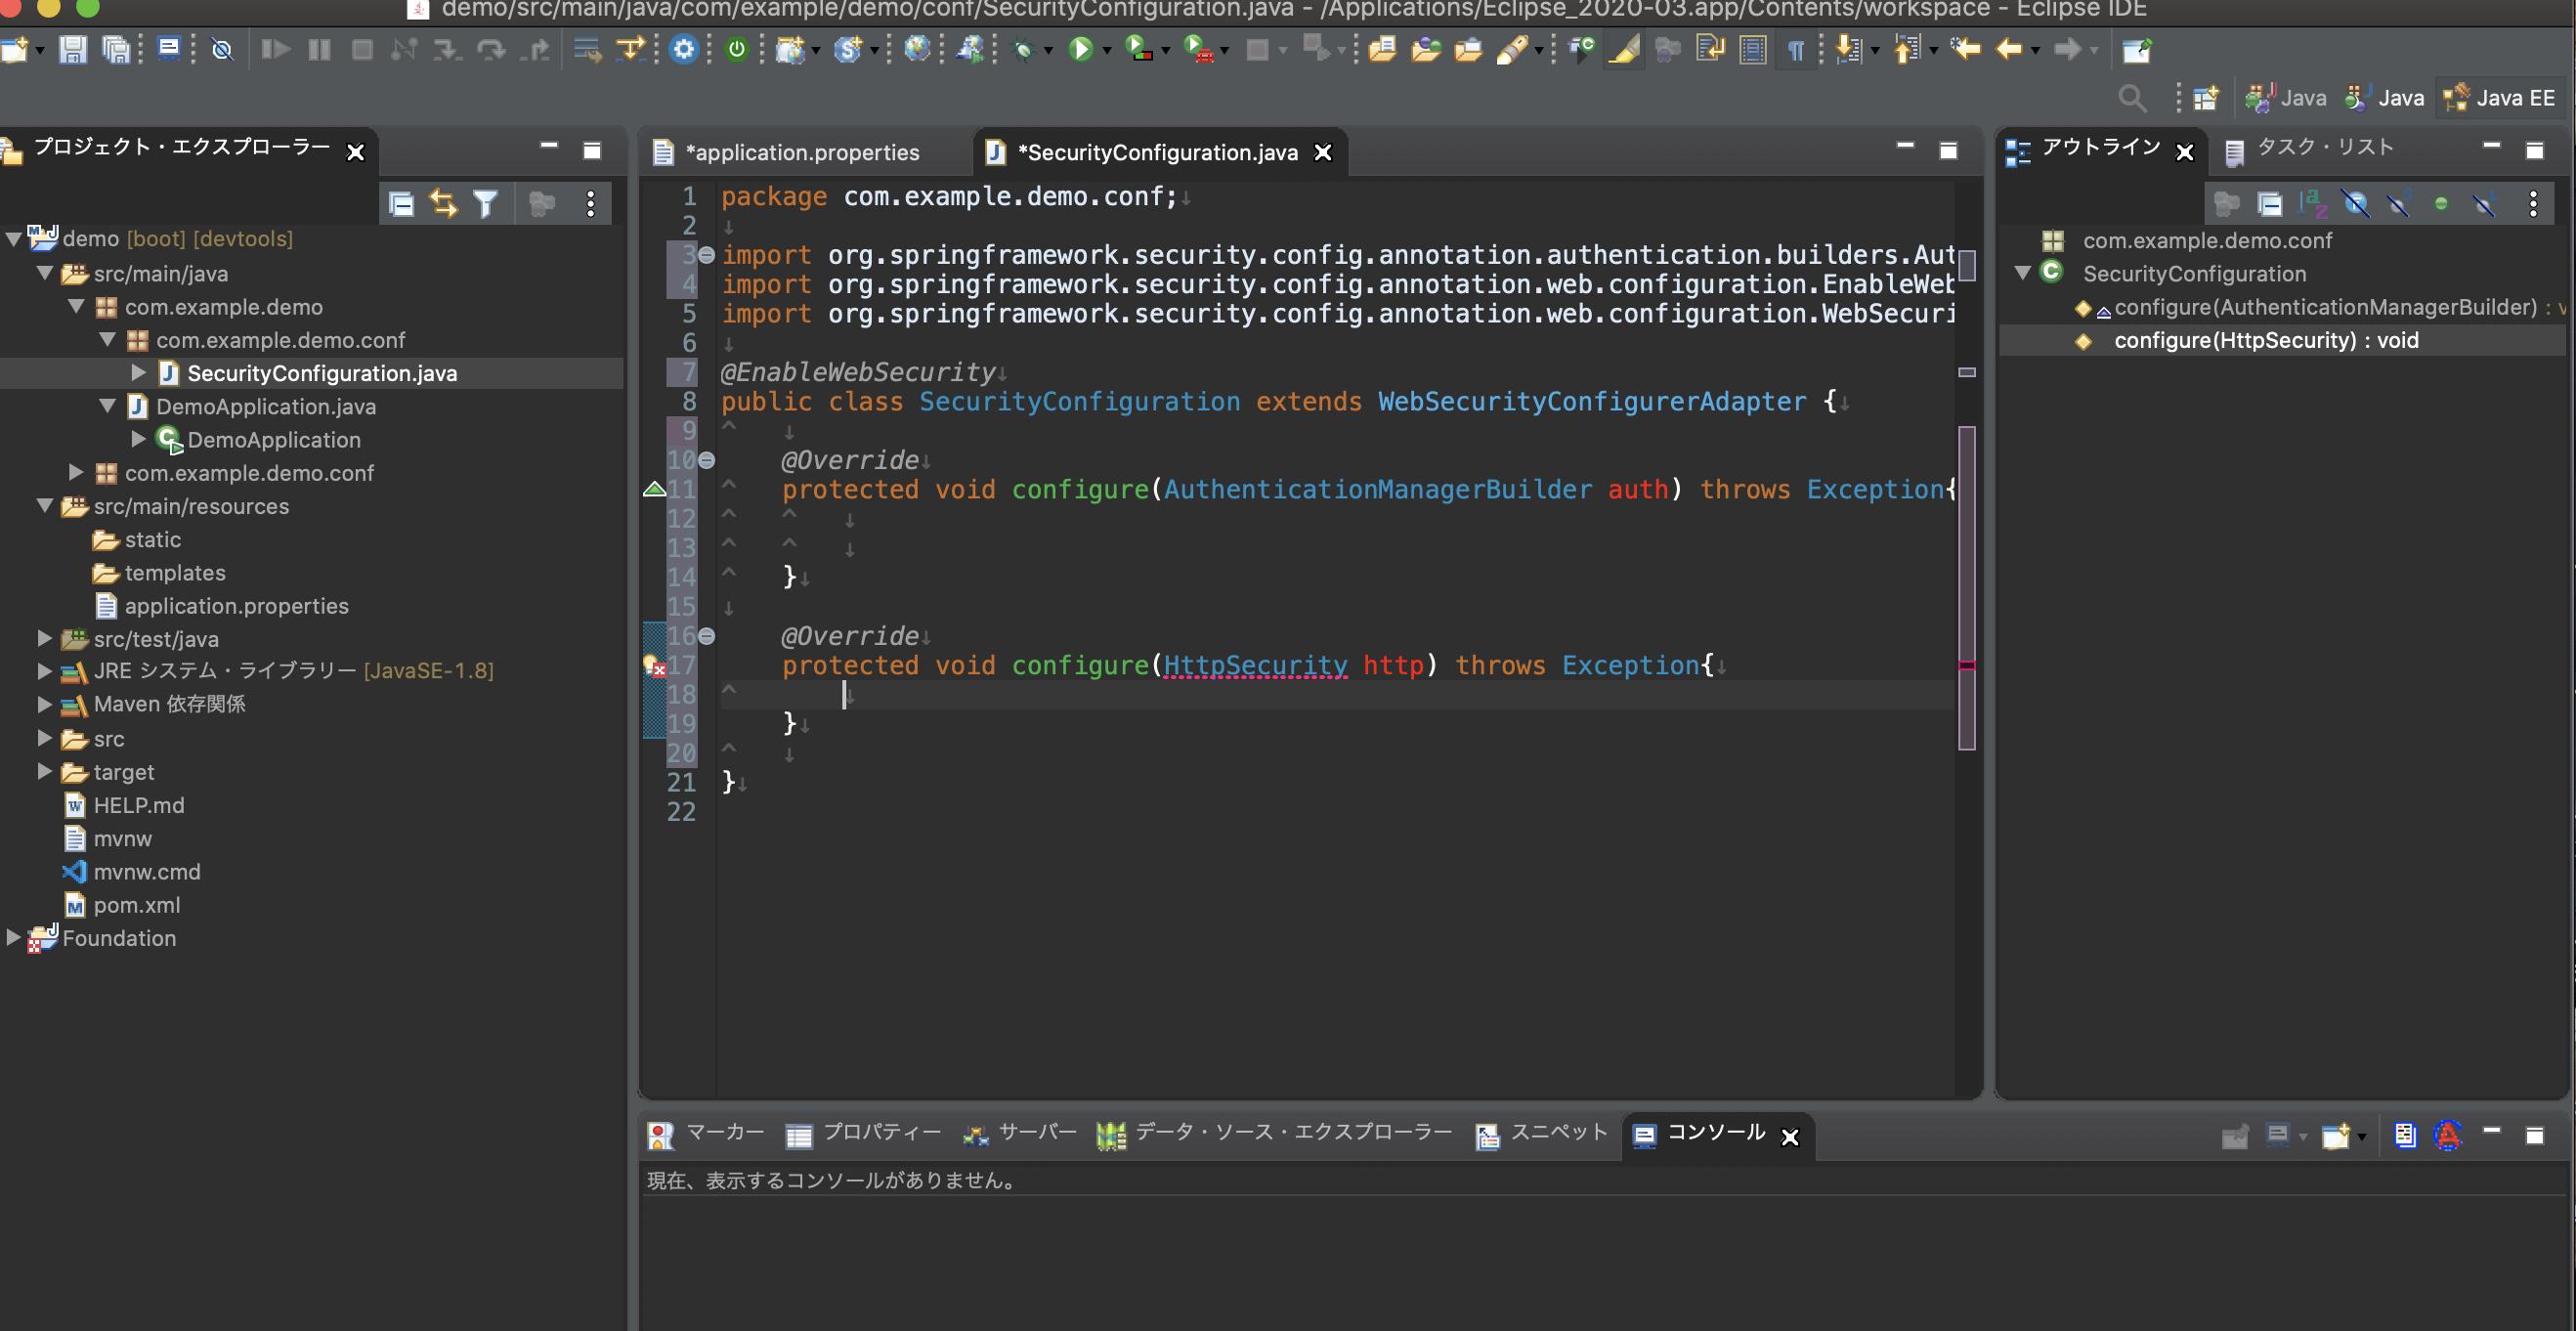 Screenshot 2020-05-25 5.39.14.png